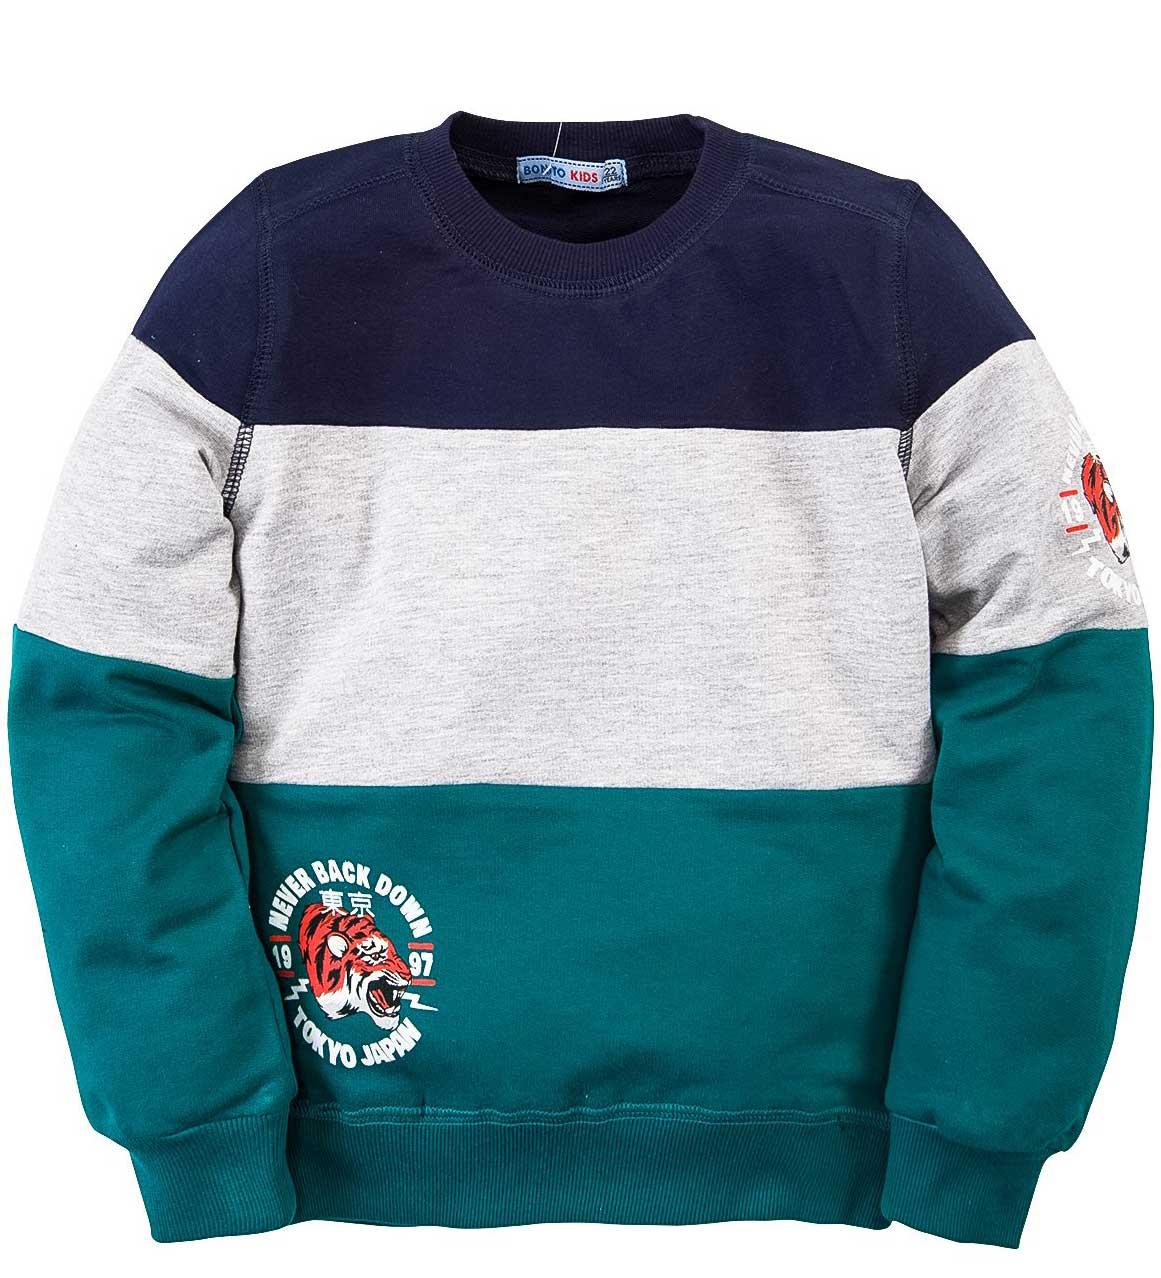 Джемпер для мальчика Bonito темно-синий с зеленым